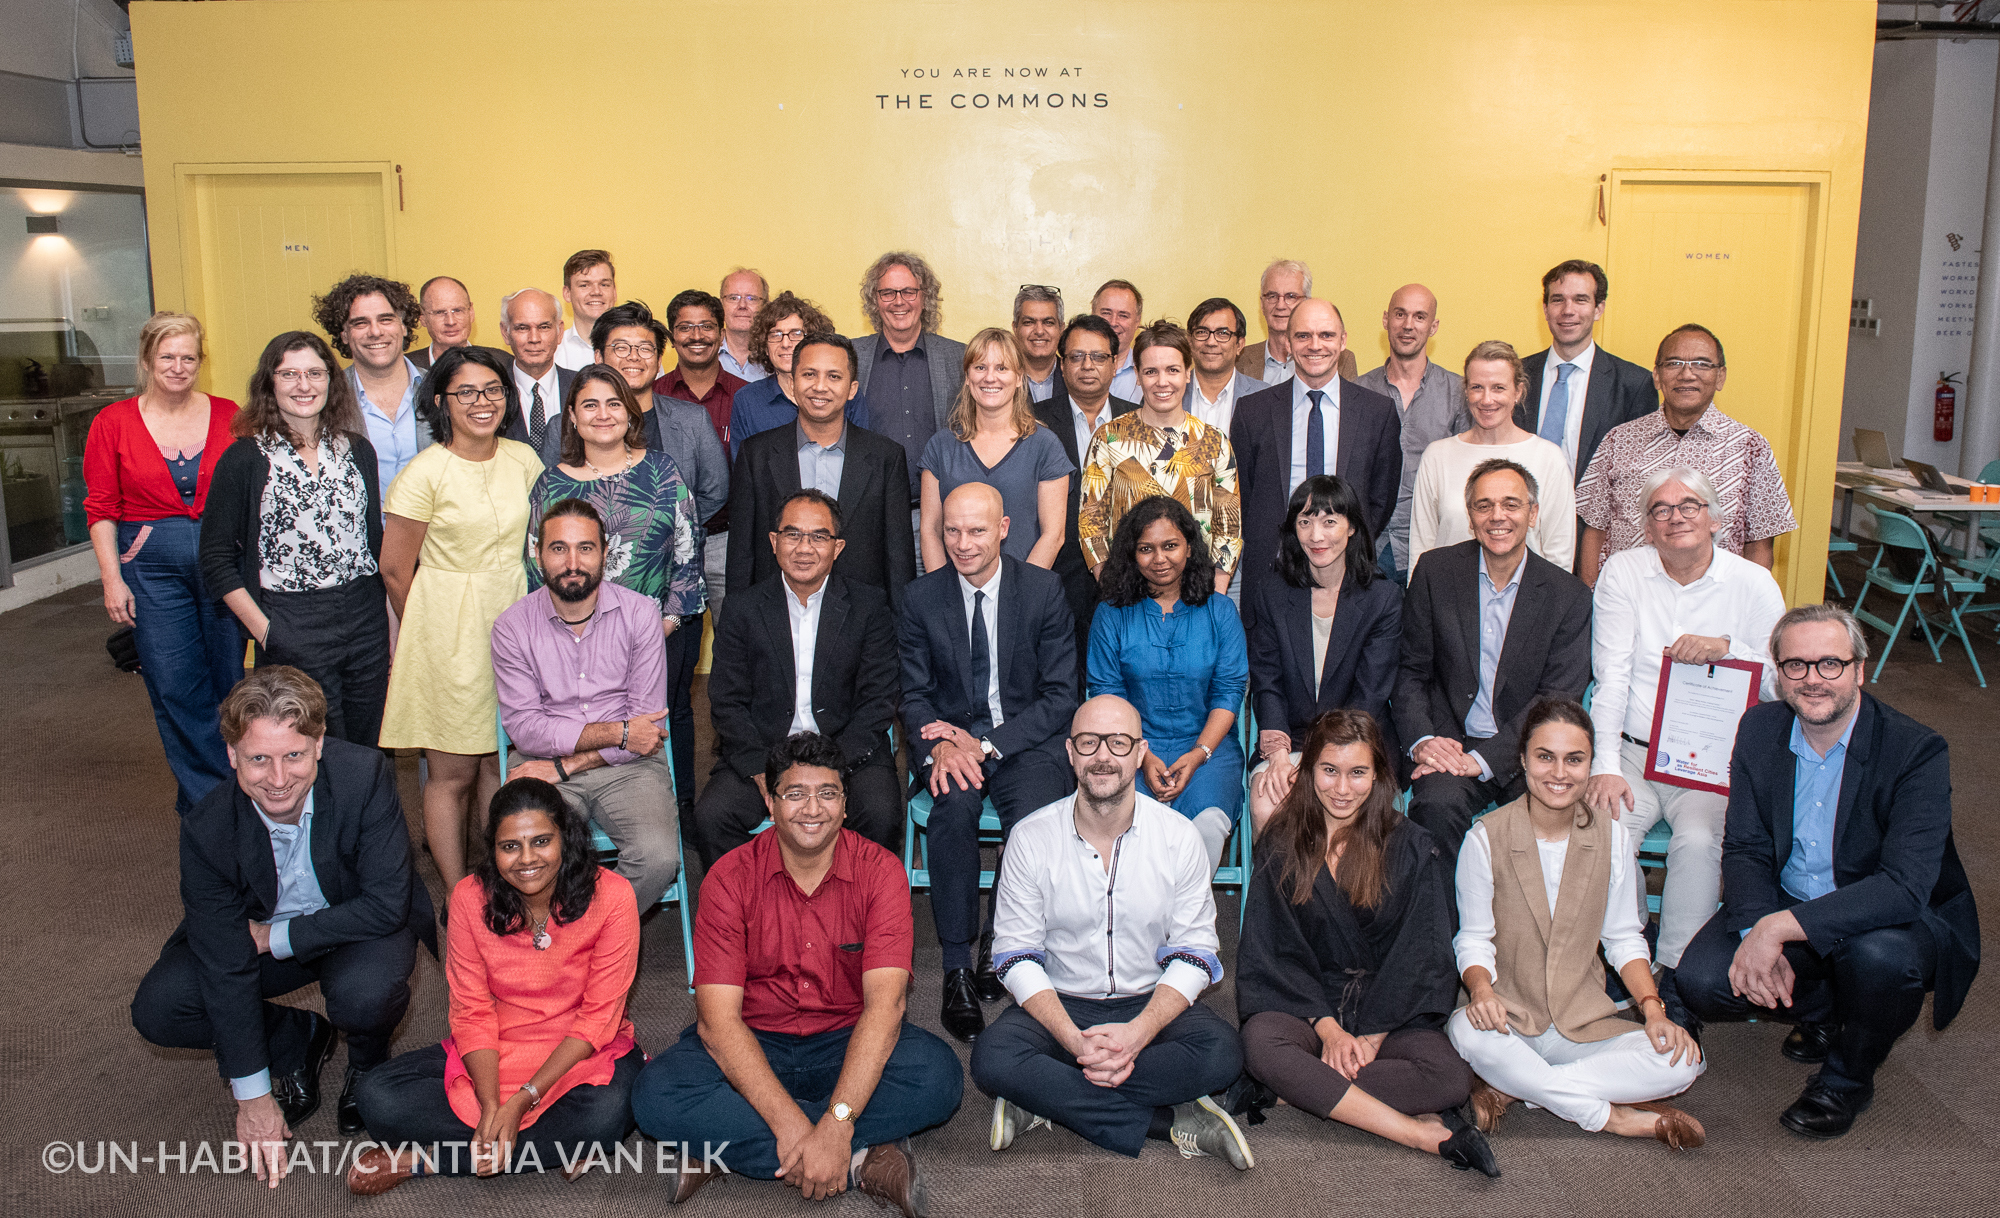 Delegates at the first regional workshop in Singapore ©CynthiavanElk/WaterasLeverage